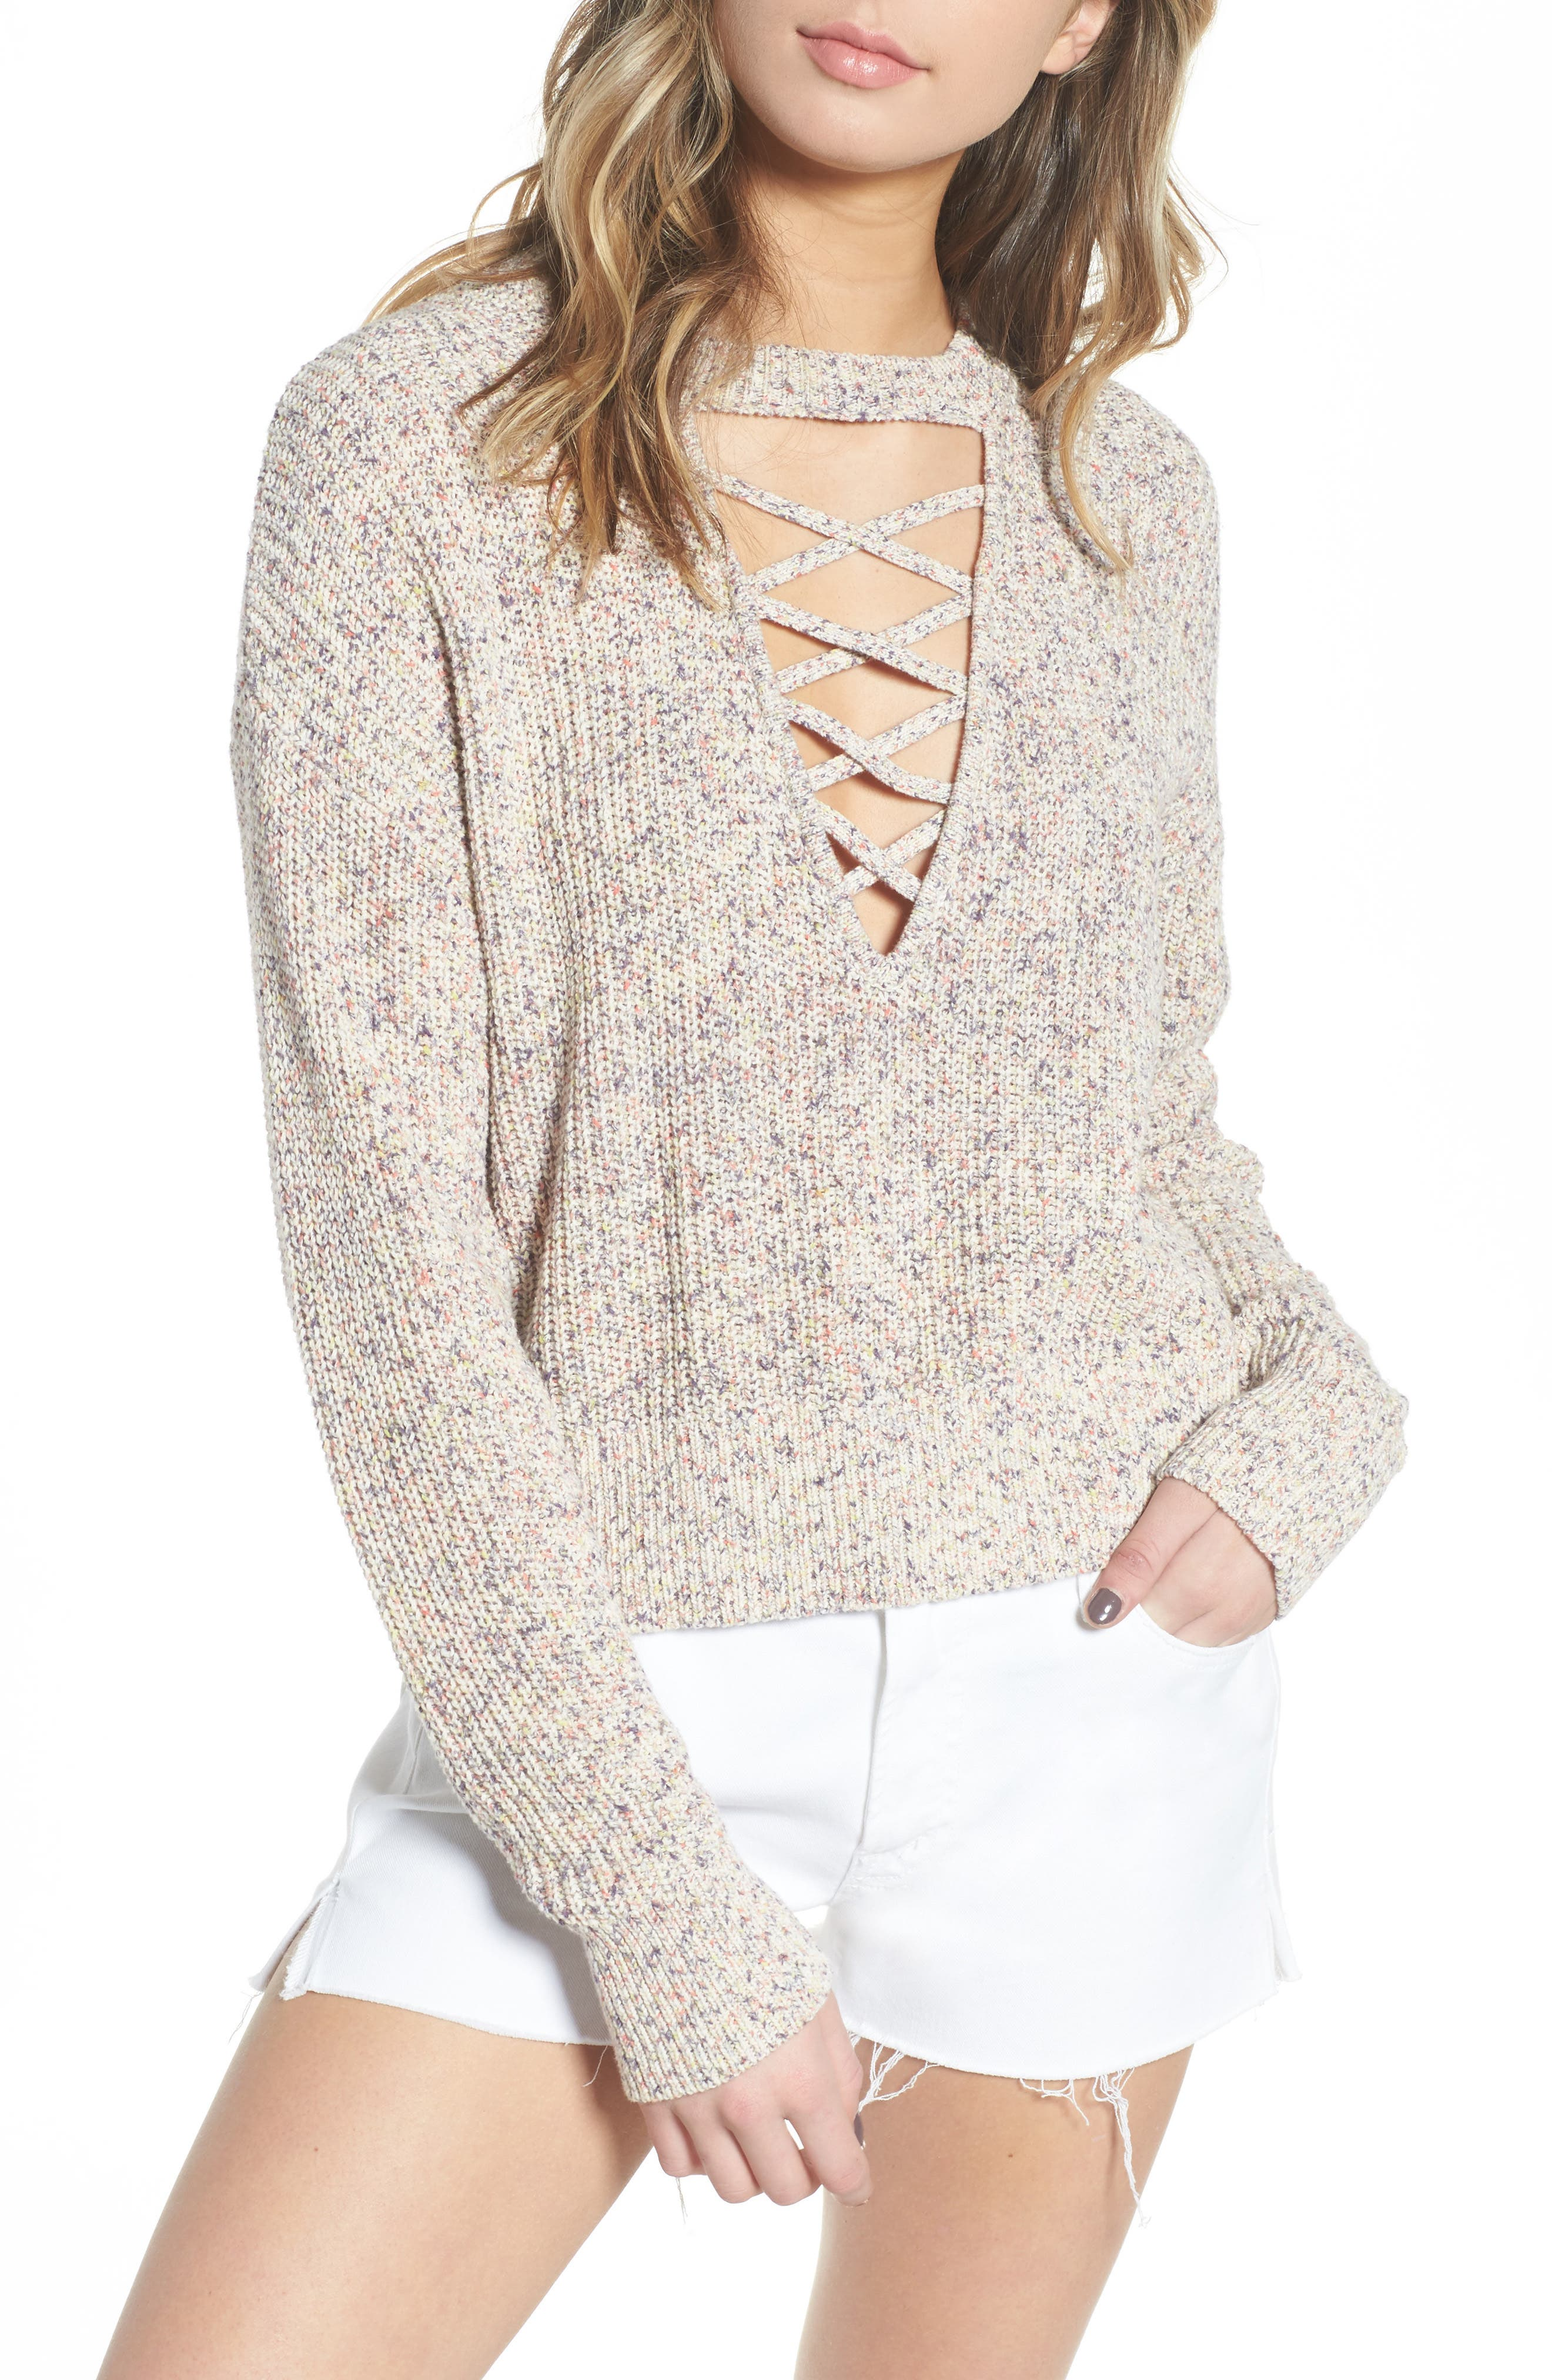 Splendid Plunging Crisscross Sweater